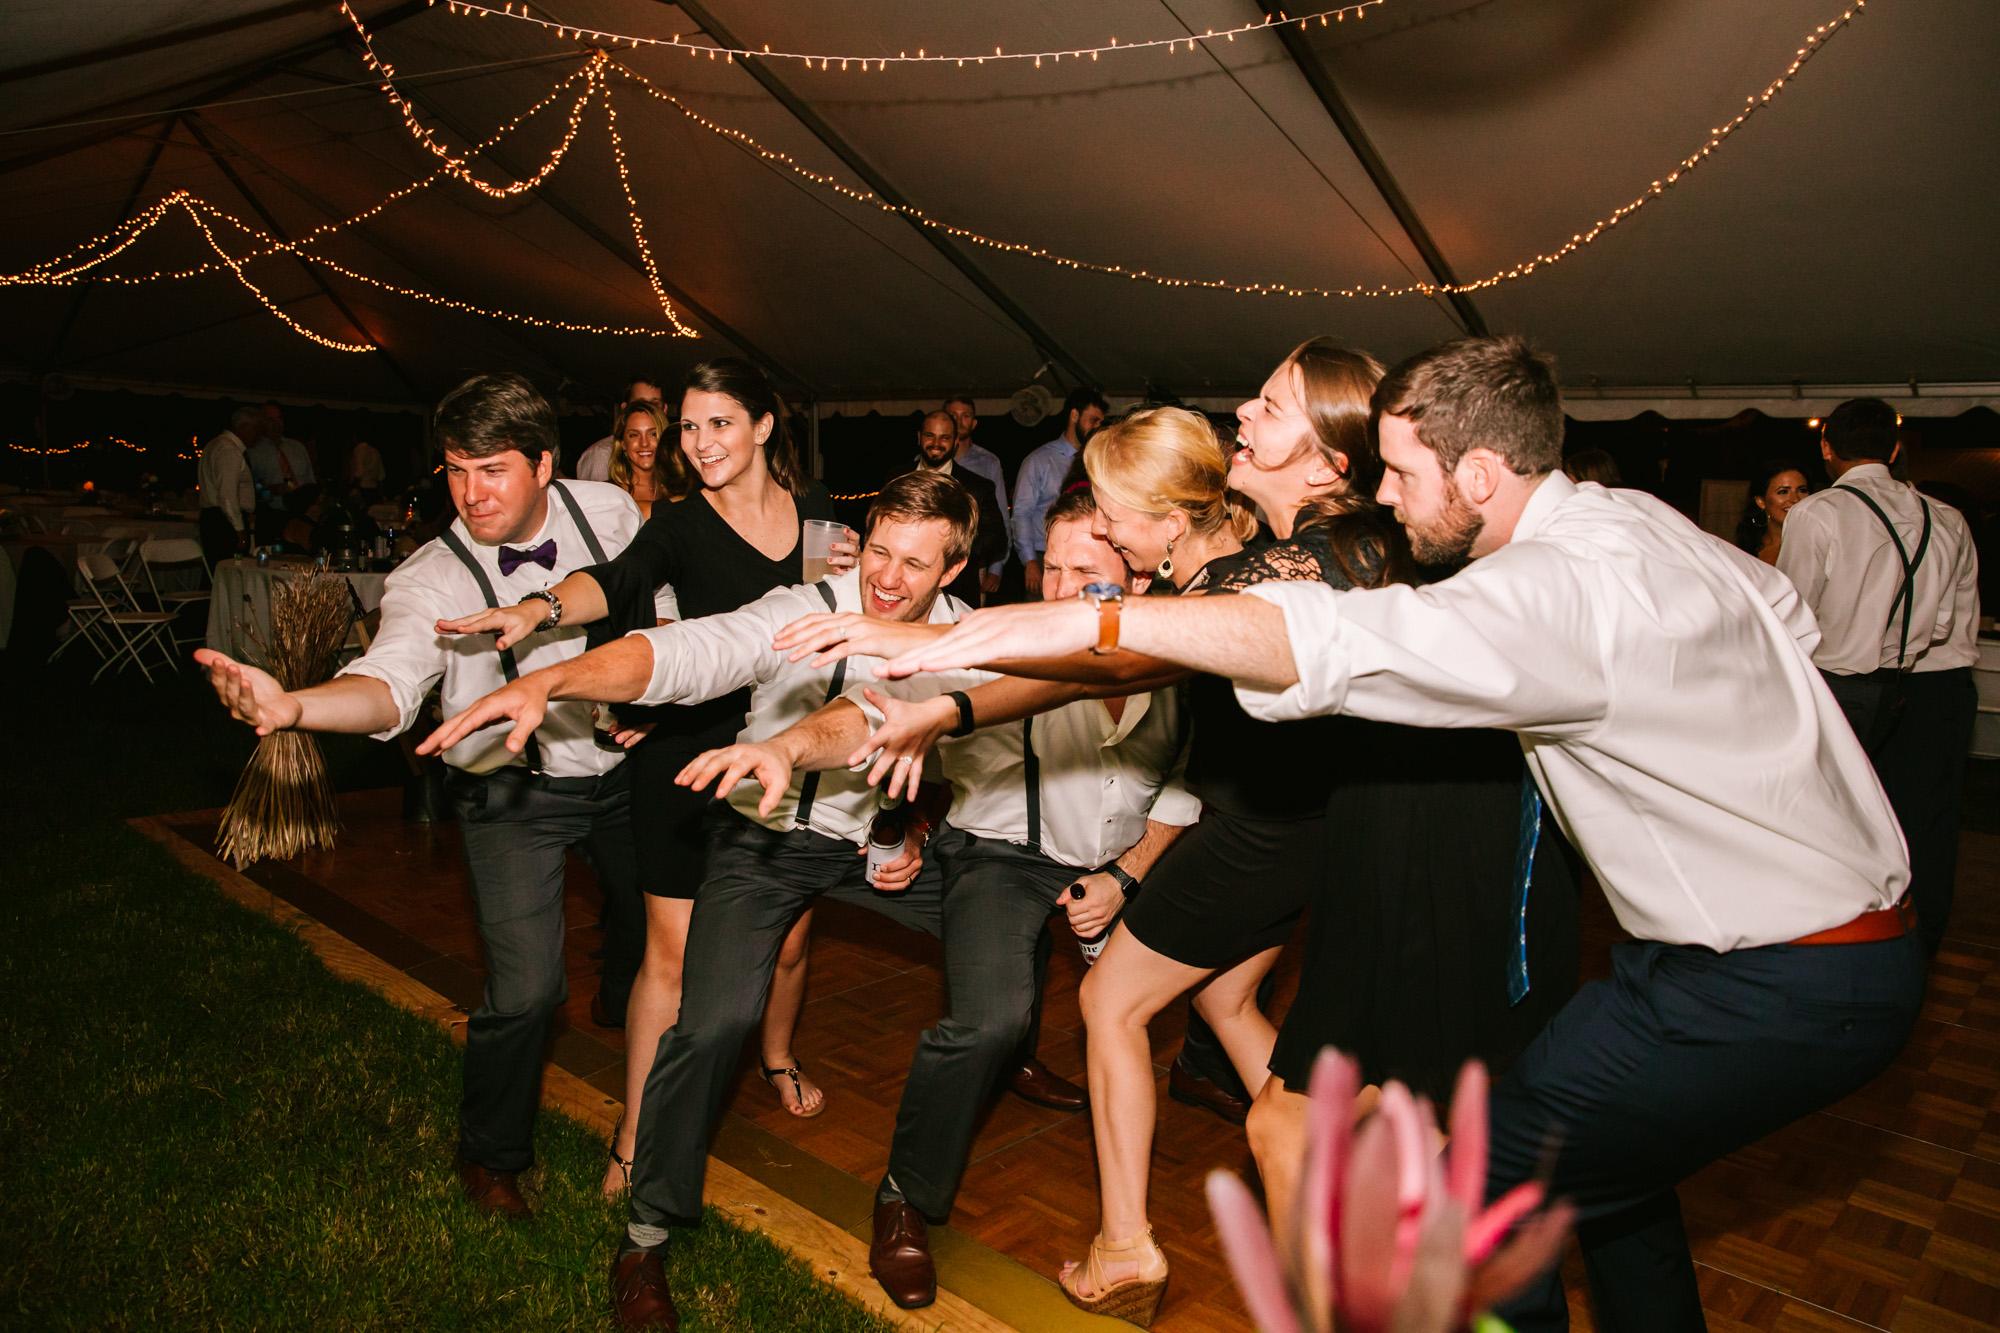 Waynesville, NC Wedding Photography | Wedding Reception Dance Floor Praising the Band